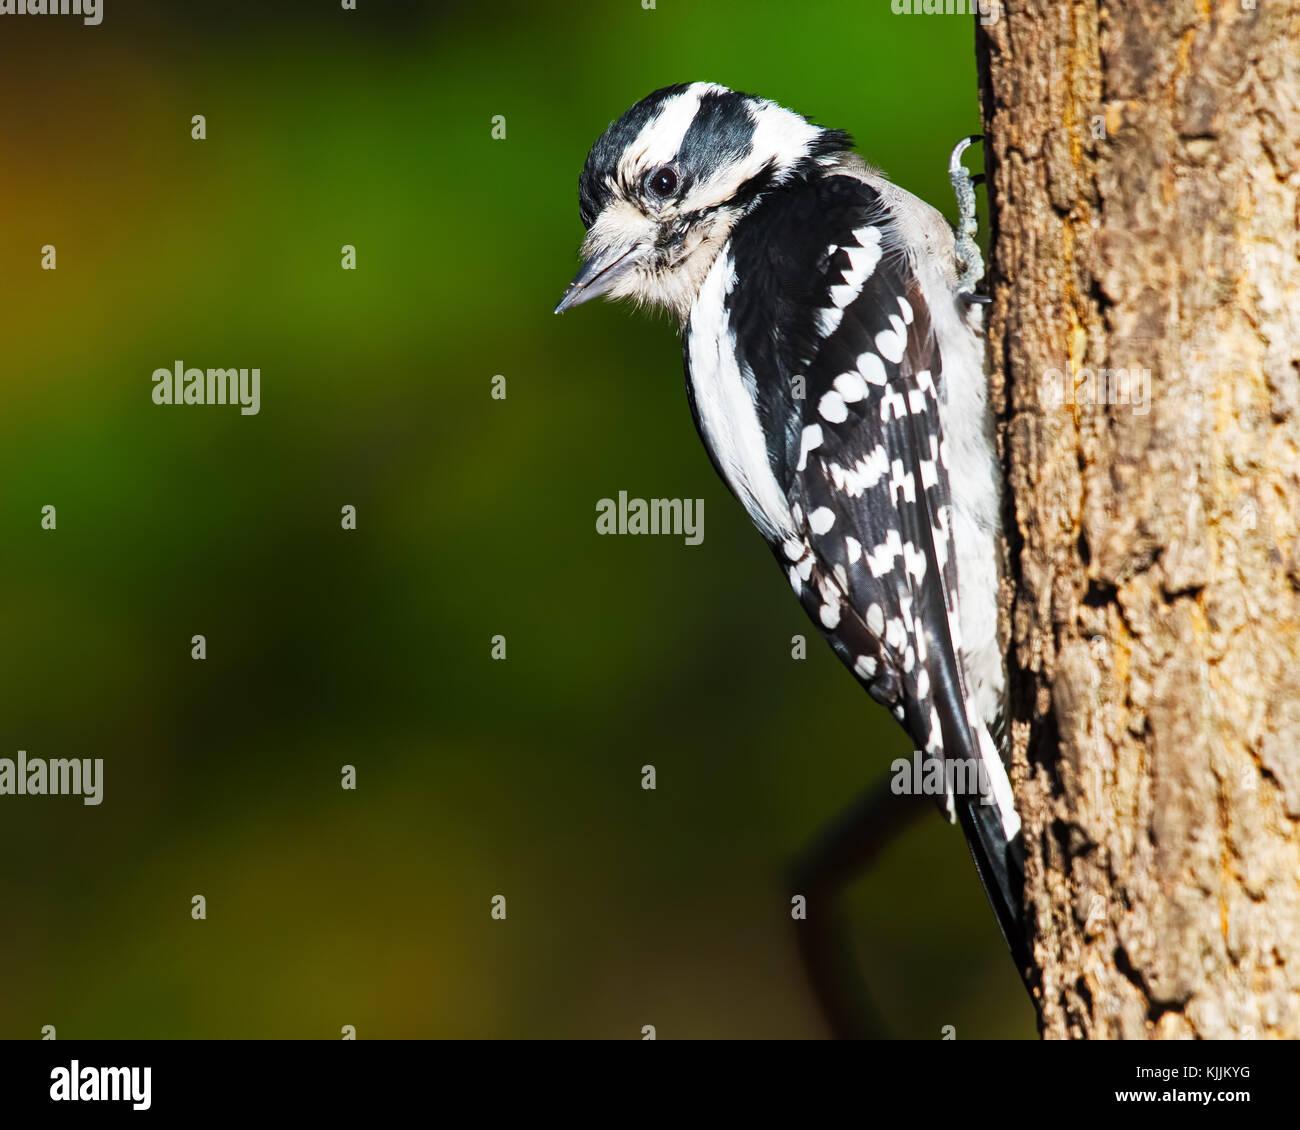 Downy Woodpecker Scaling Tree - Stock Image